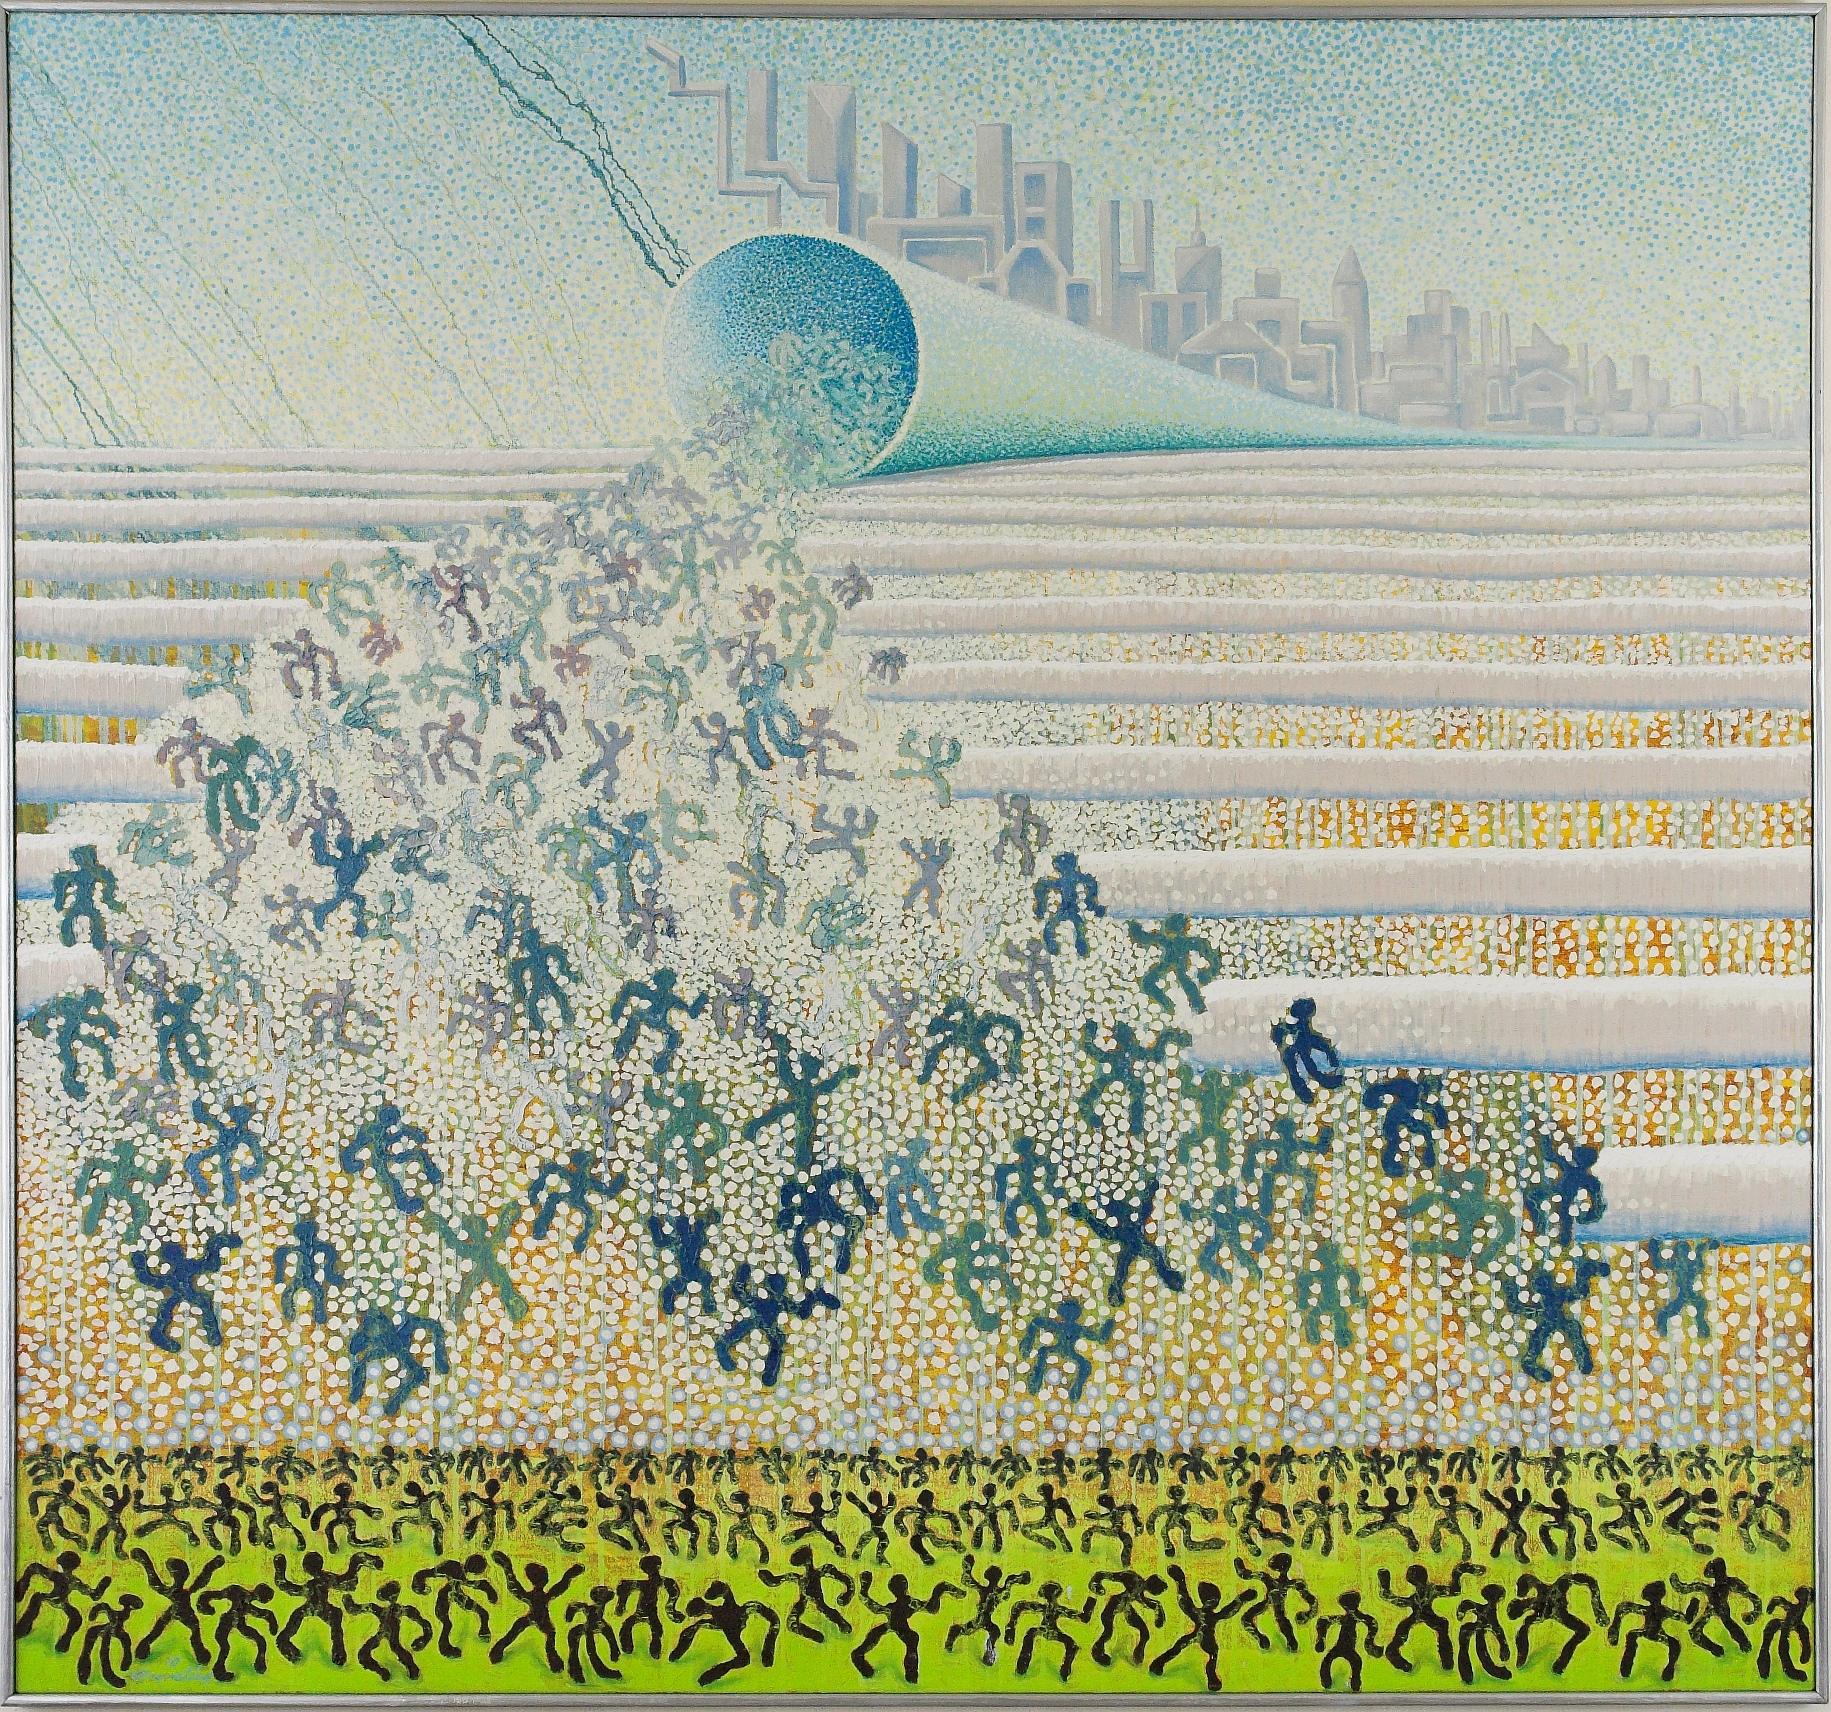 Ghostparade 2010  186 x 201 cm  Öl auf Jute